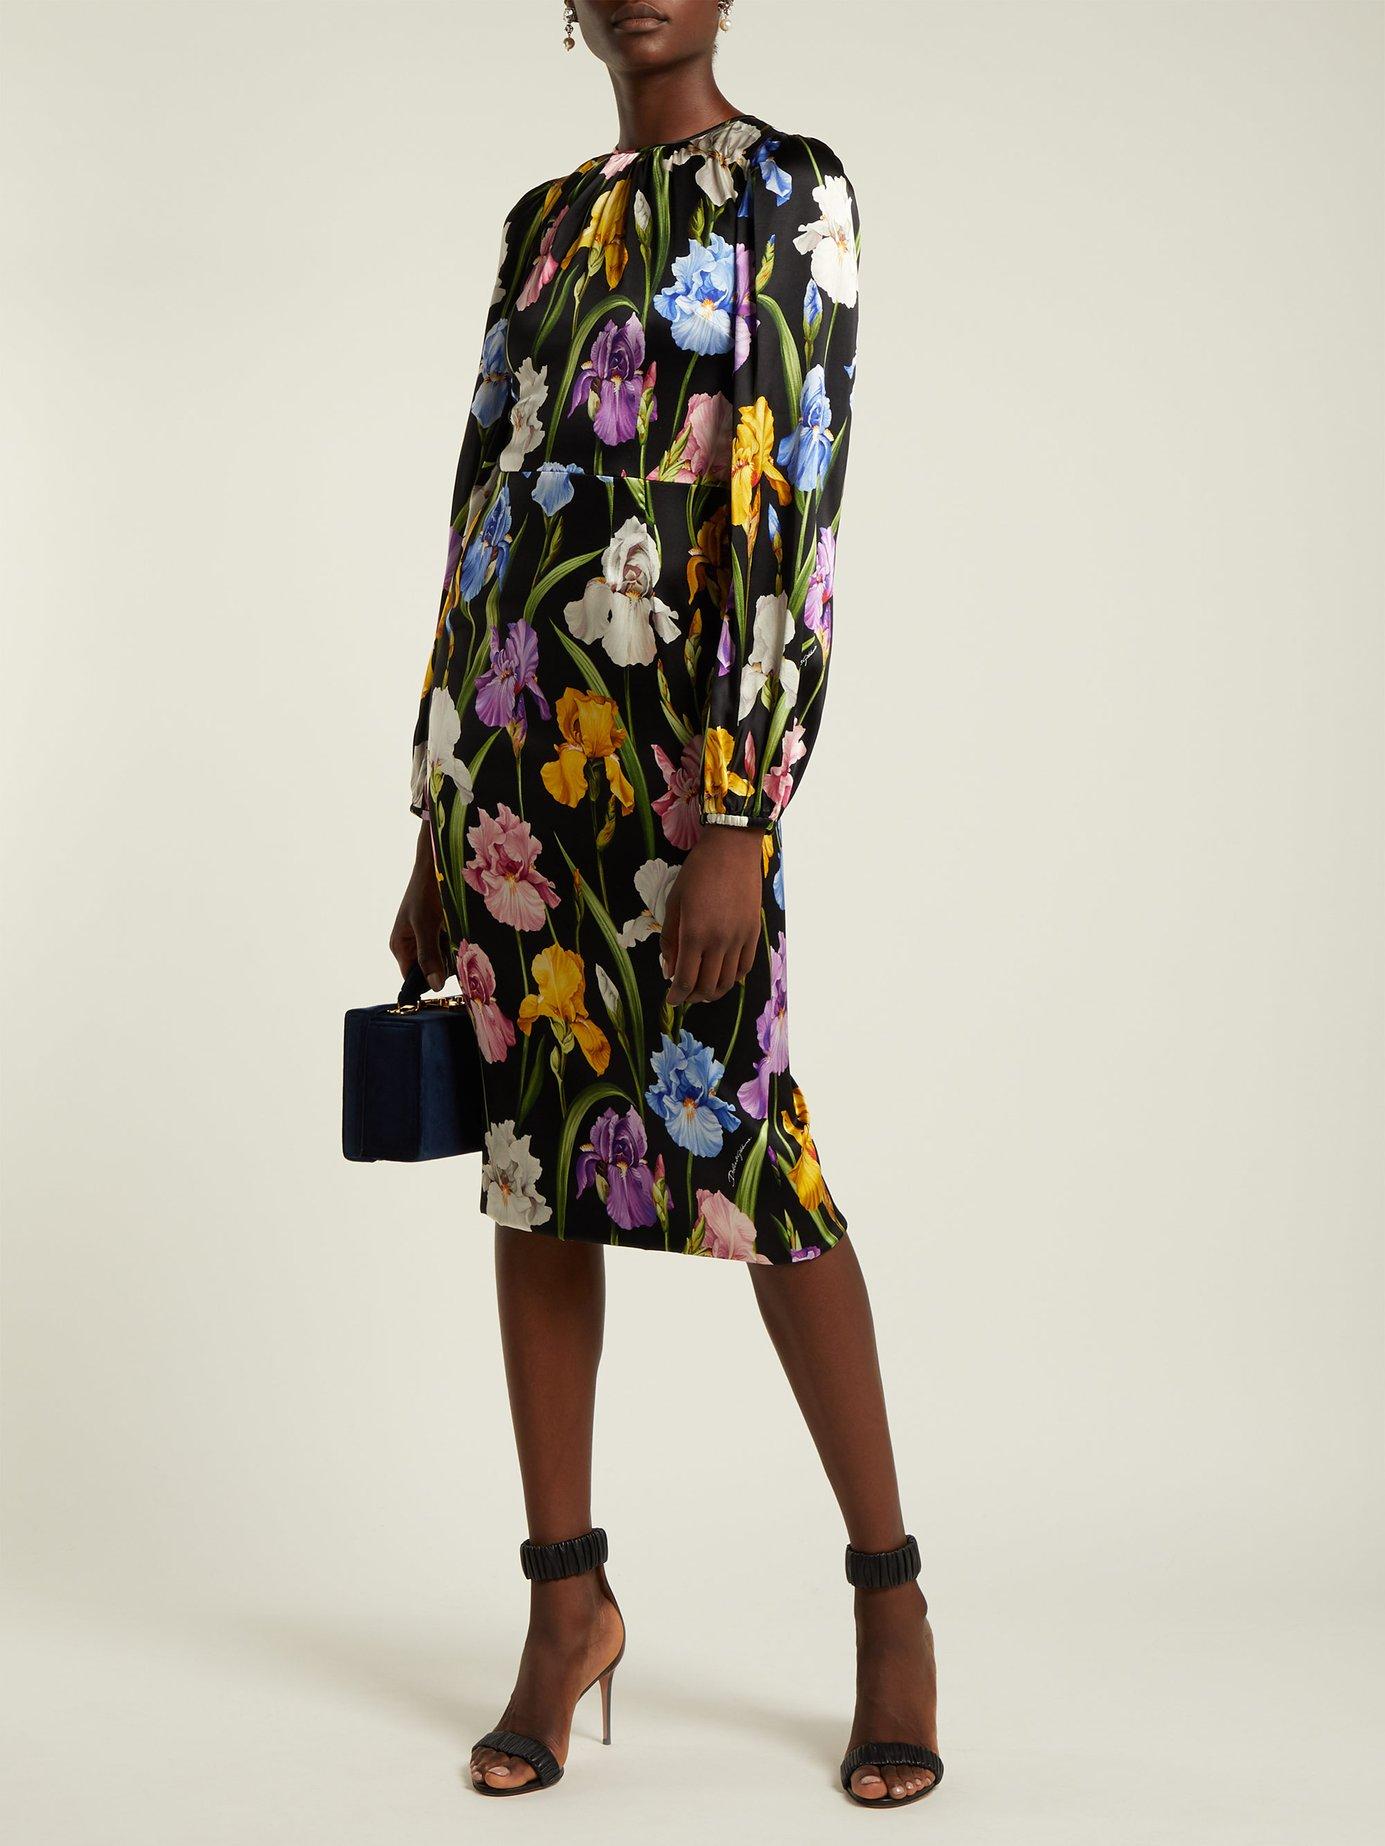 Iris-print midi dress by Dolce & Gabbana